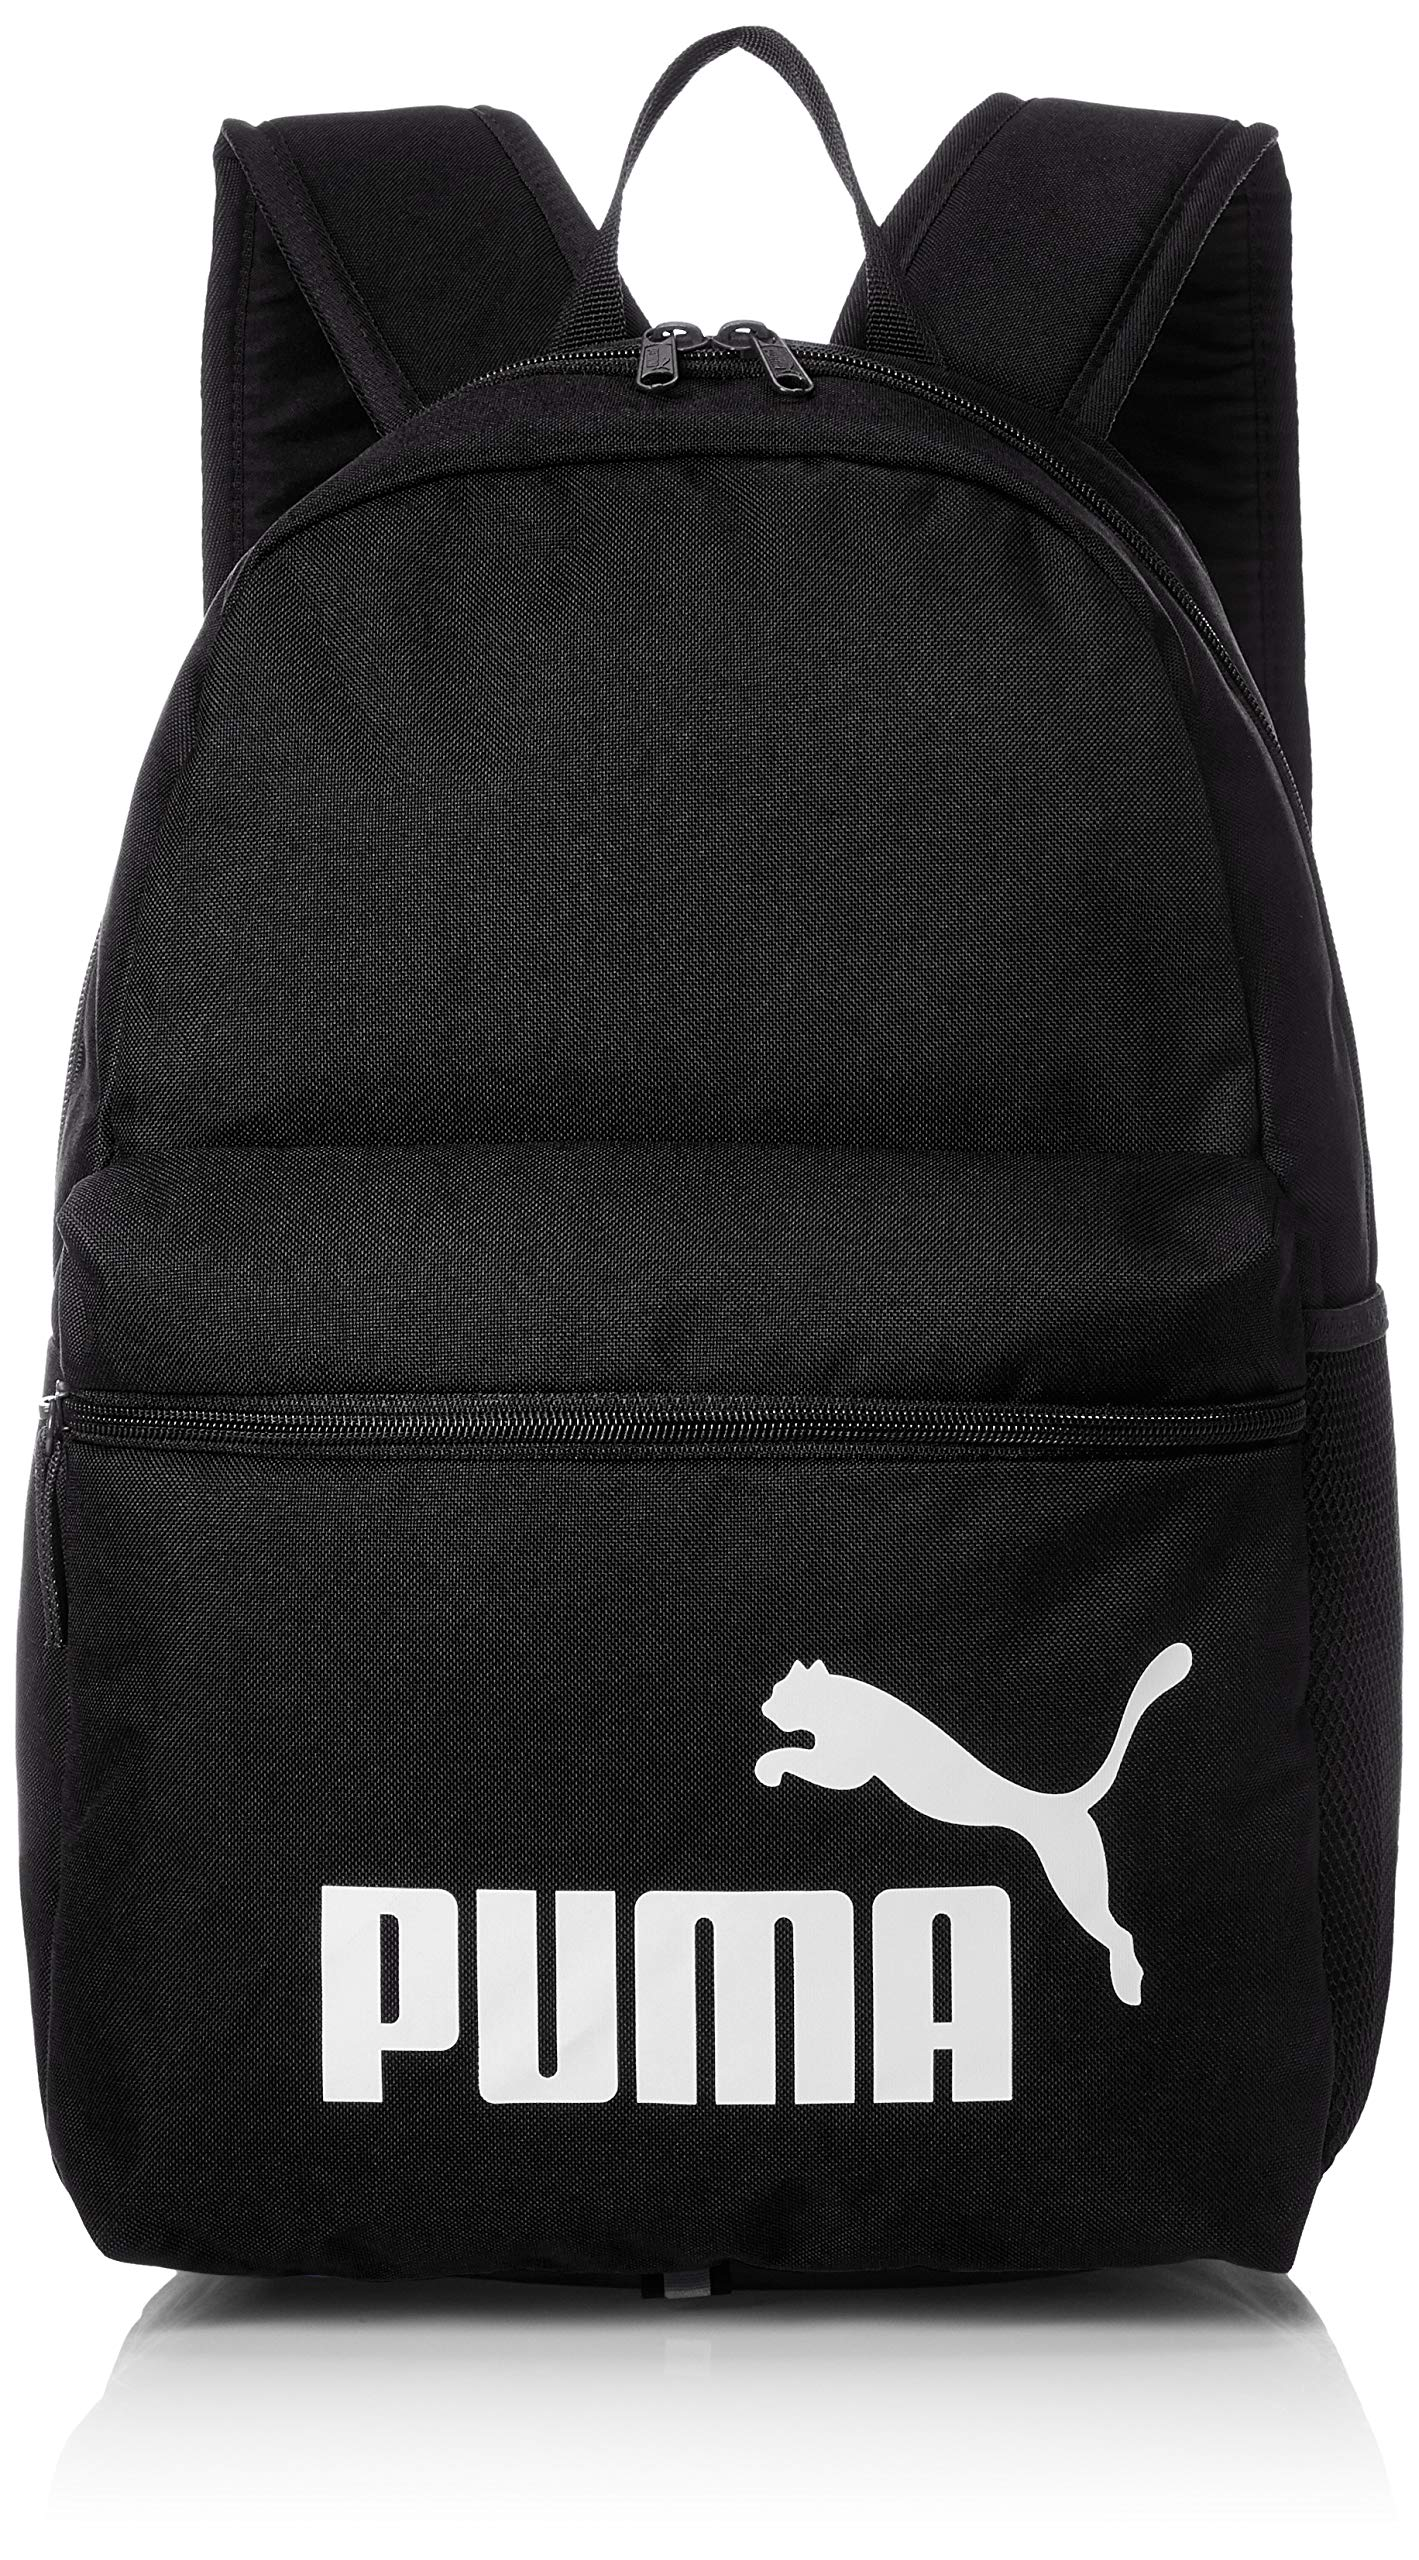 PUMA Phase Backpack Laptop shool sports 758487 01 black, color:black